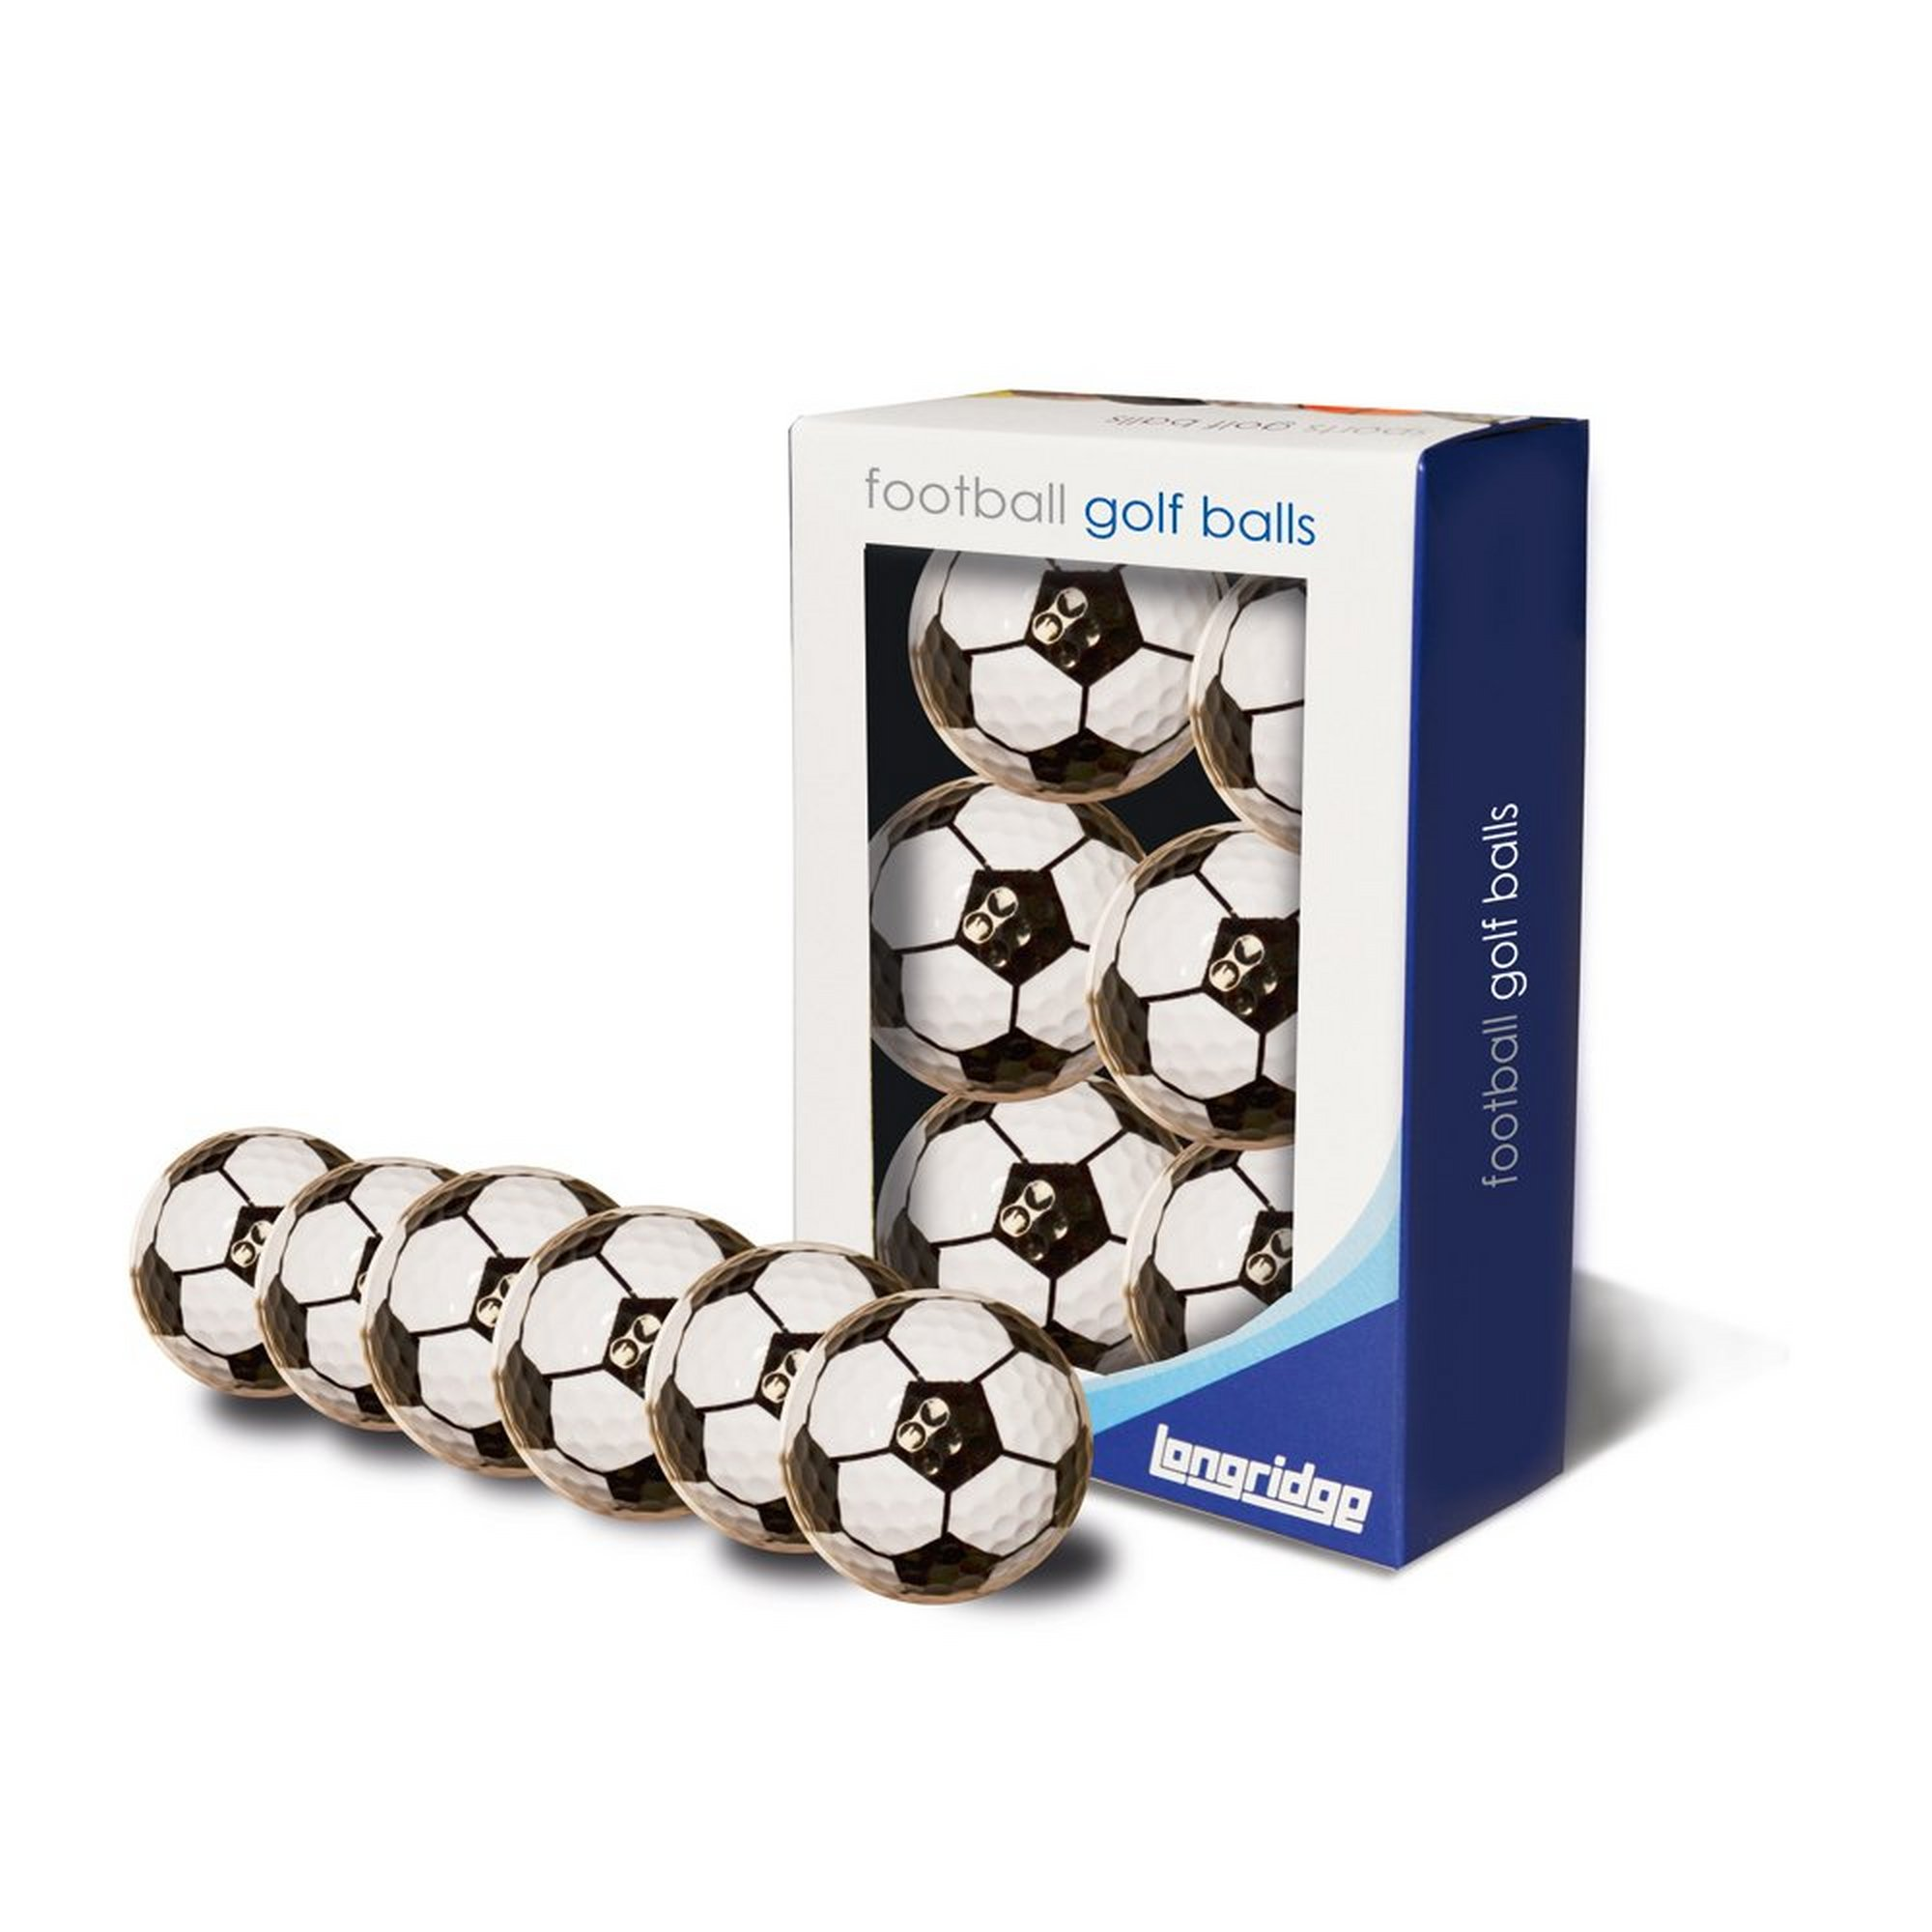 Image of Longridge Pack of 6 Football Print Golf Balls